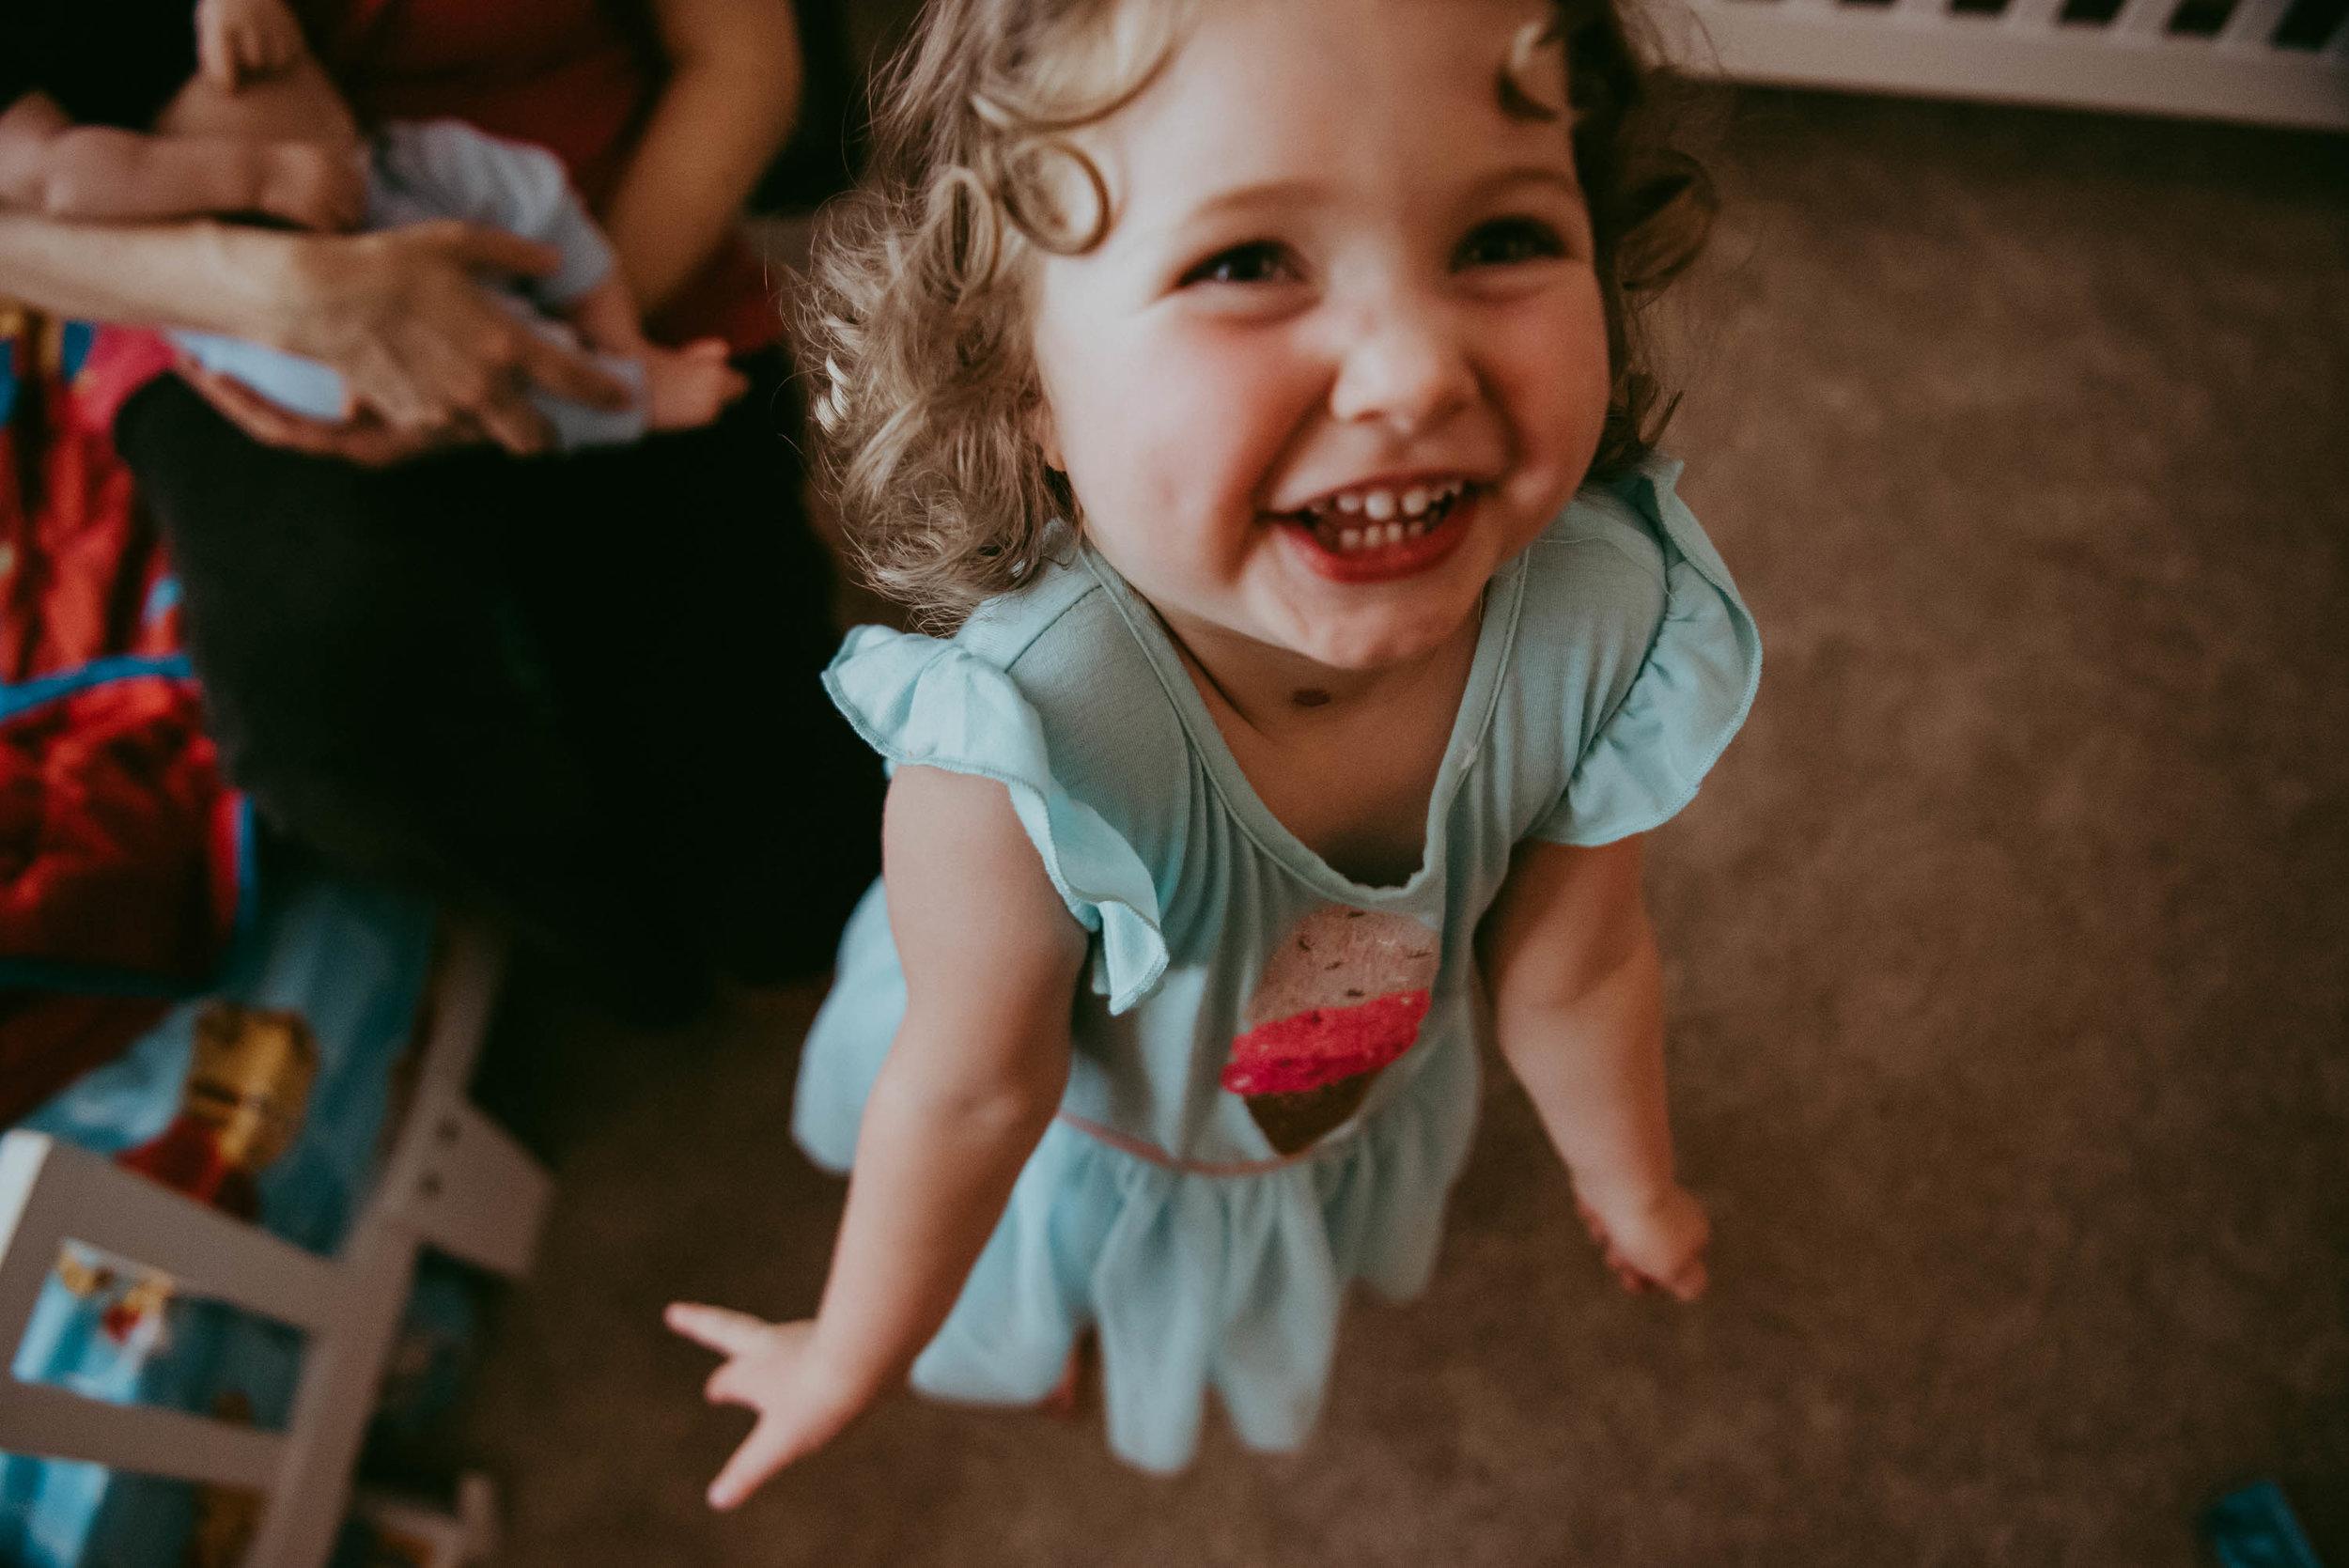 Lets_Spread_Beauty_Photography_Hamill Newborn20150728_0652.jpg